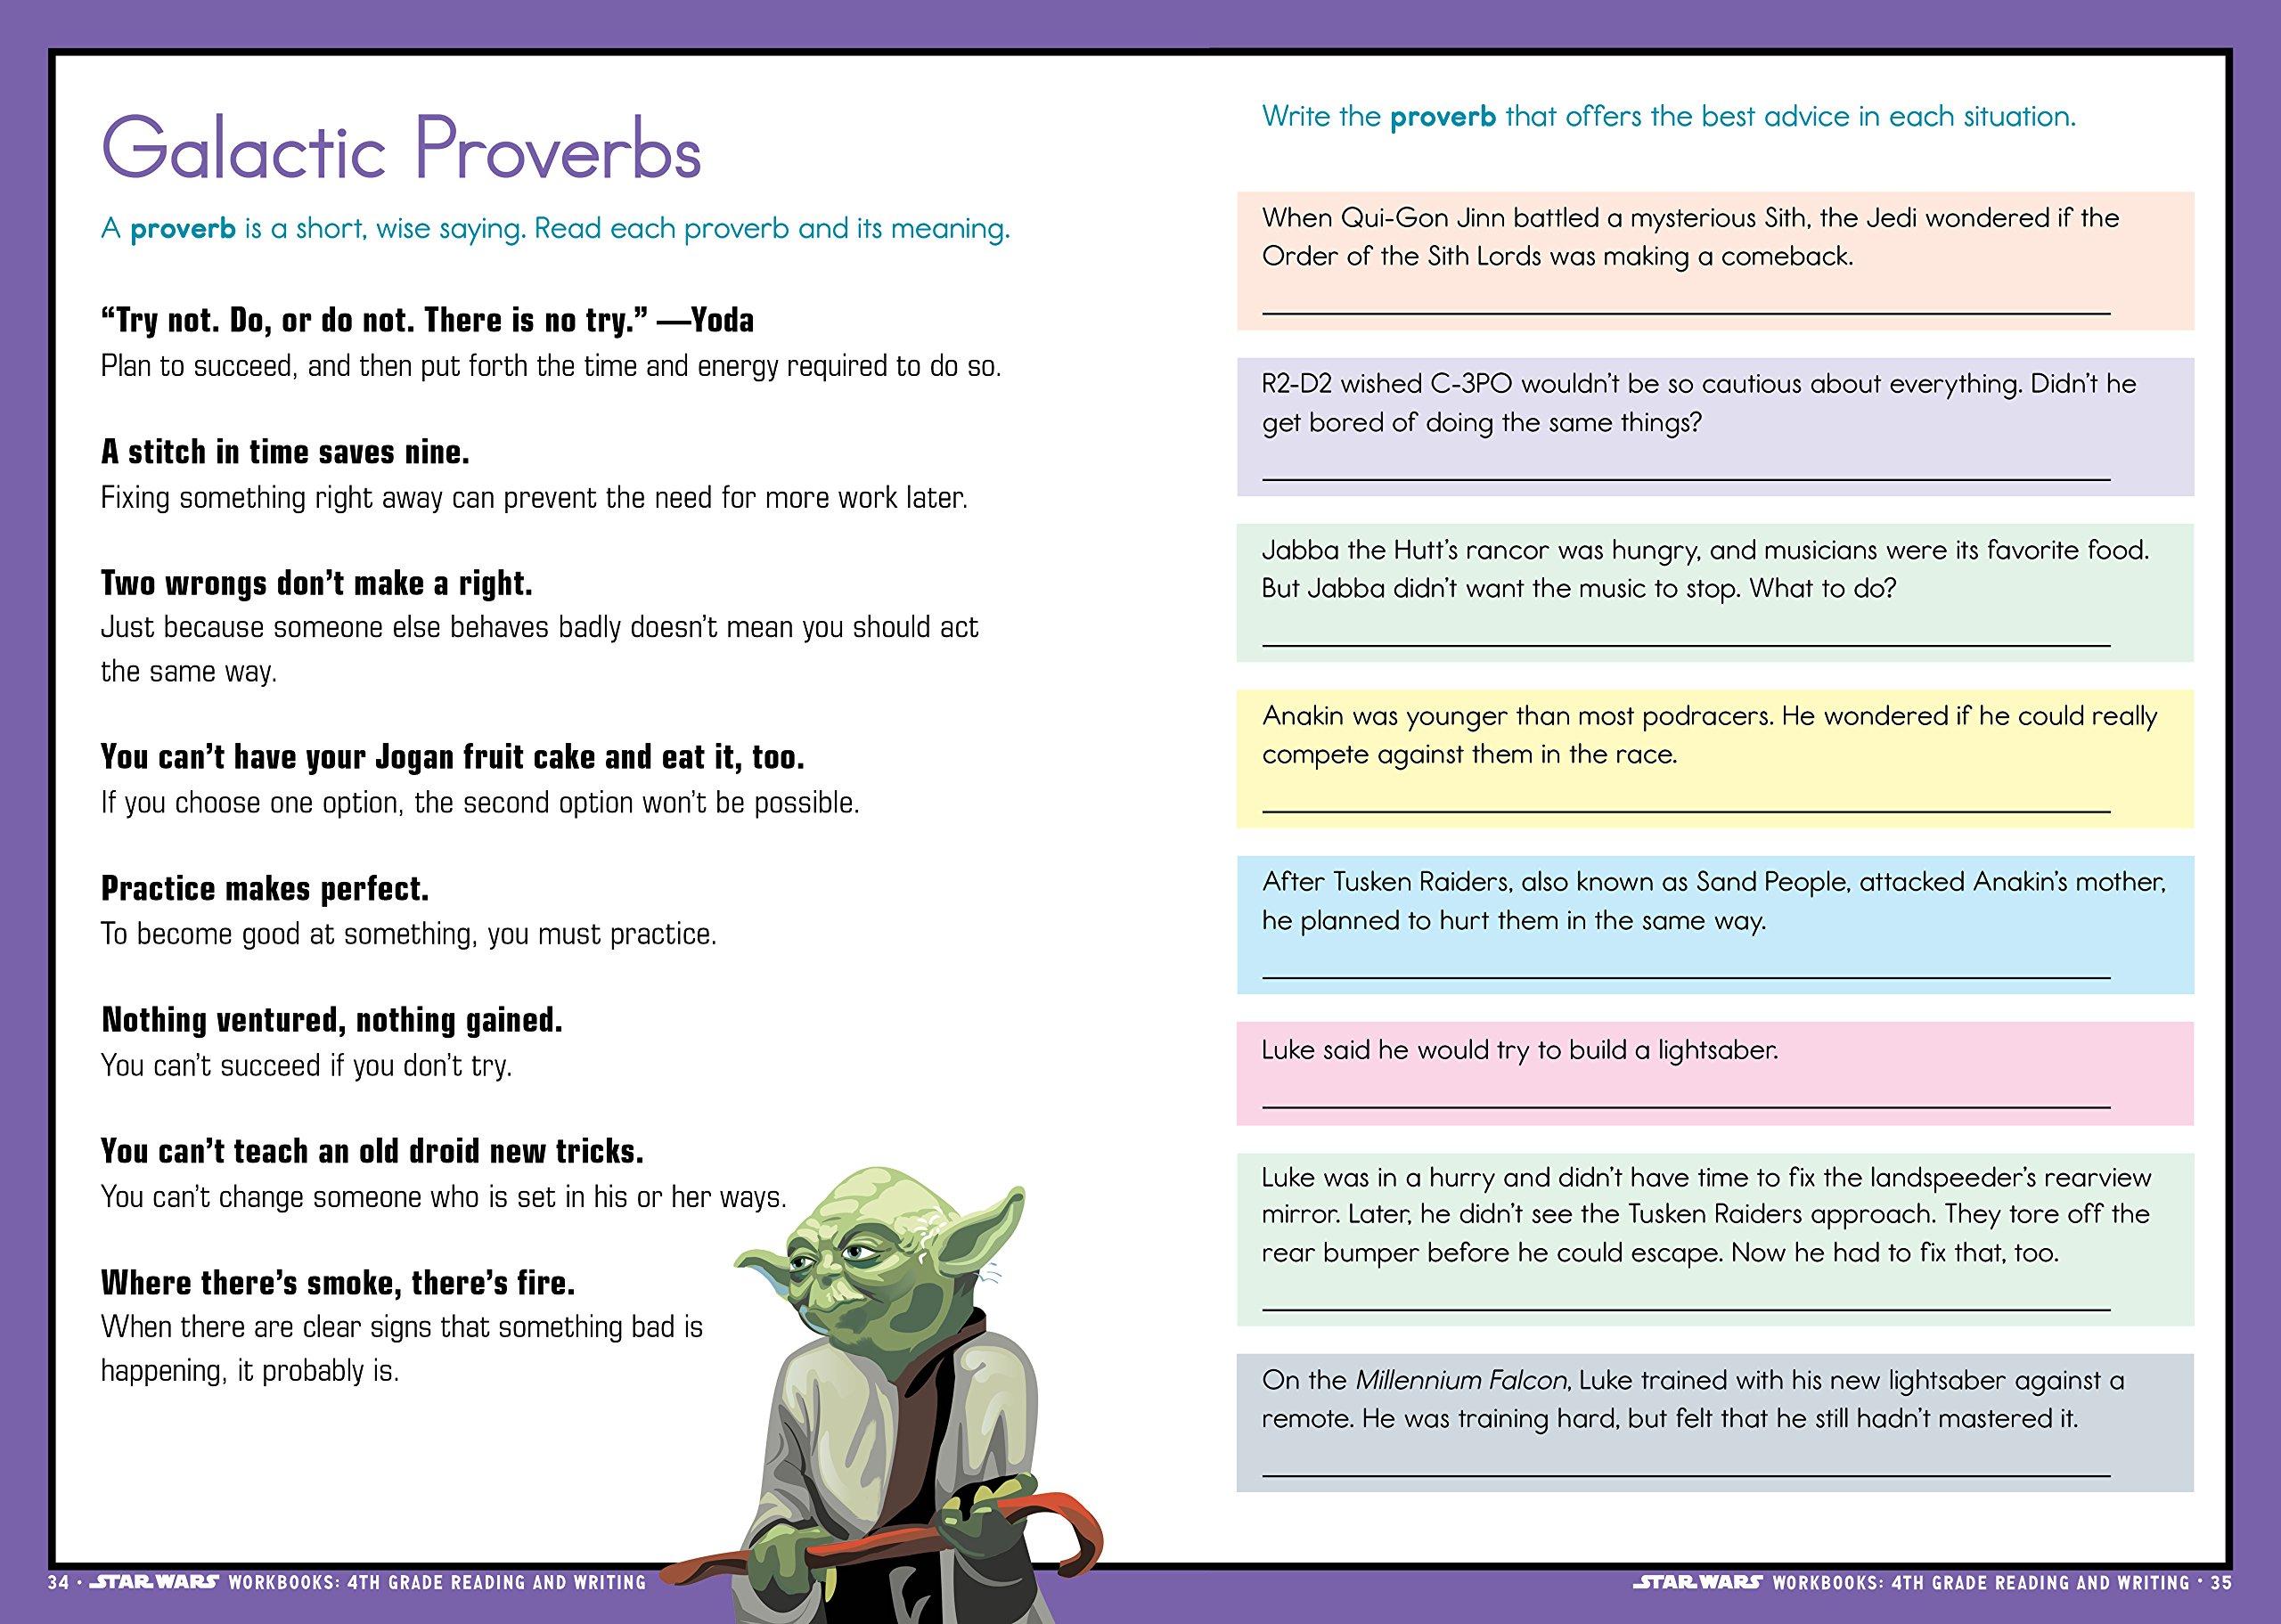 - Star Wars Workbook: 4th Grade Reading And Writing (Star Wars